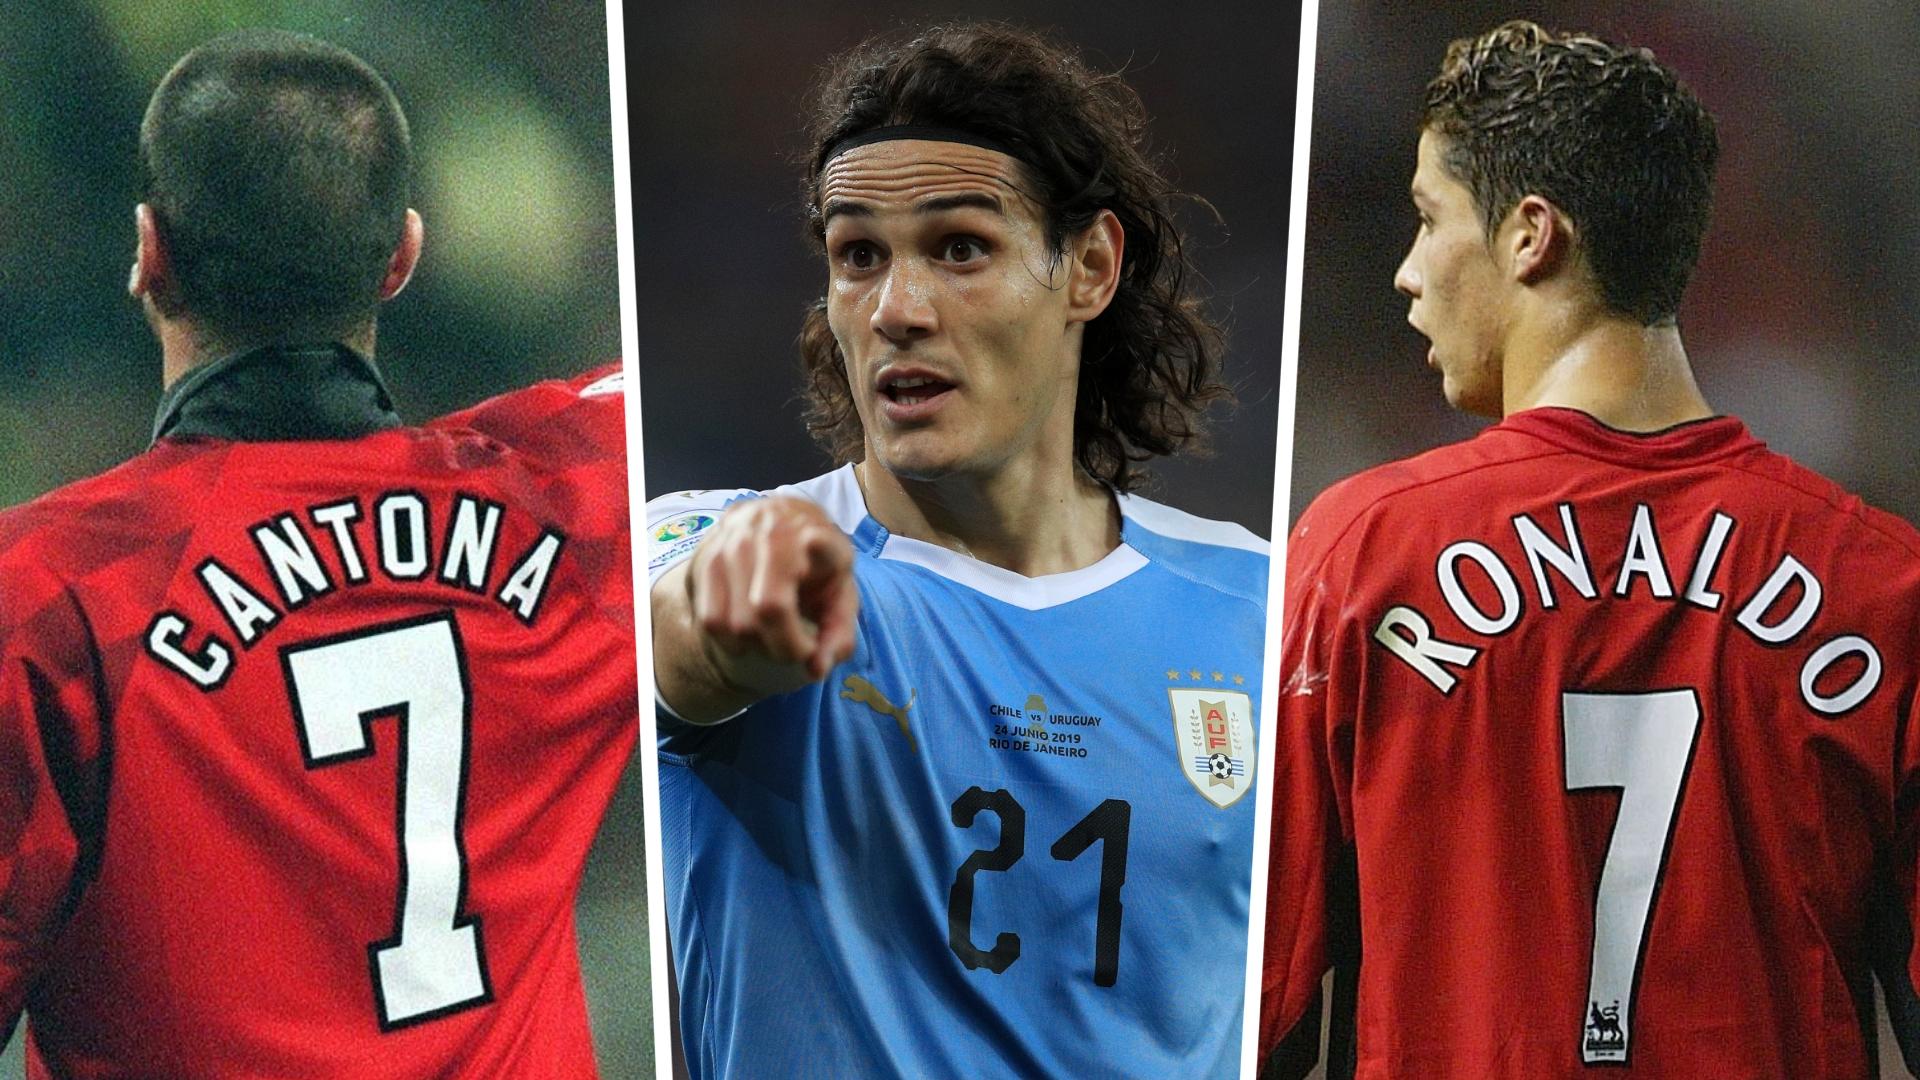 Cavani embraces pressure of No.7 shirt at Man Utd as he follows Cantona, Beckham & Ronaldo